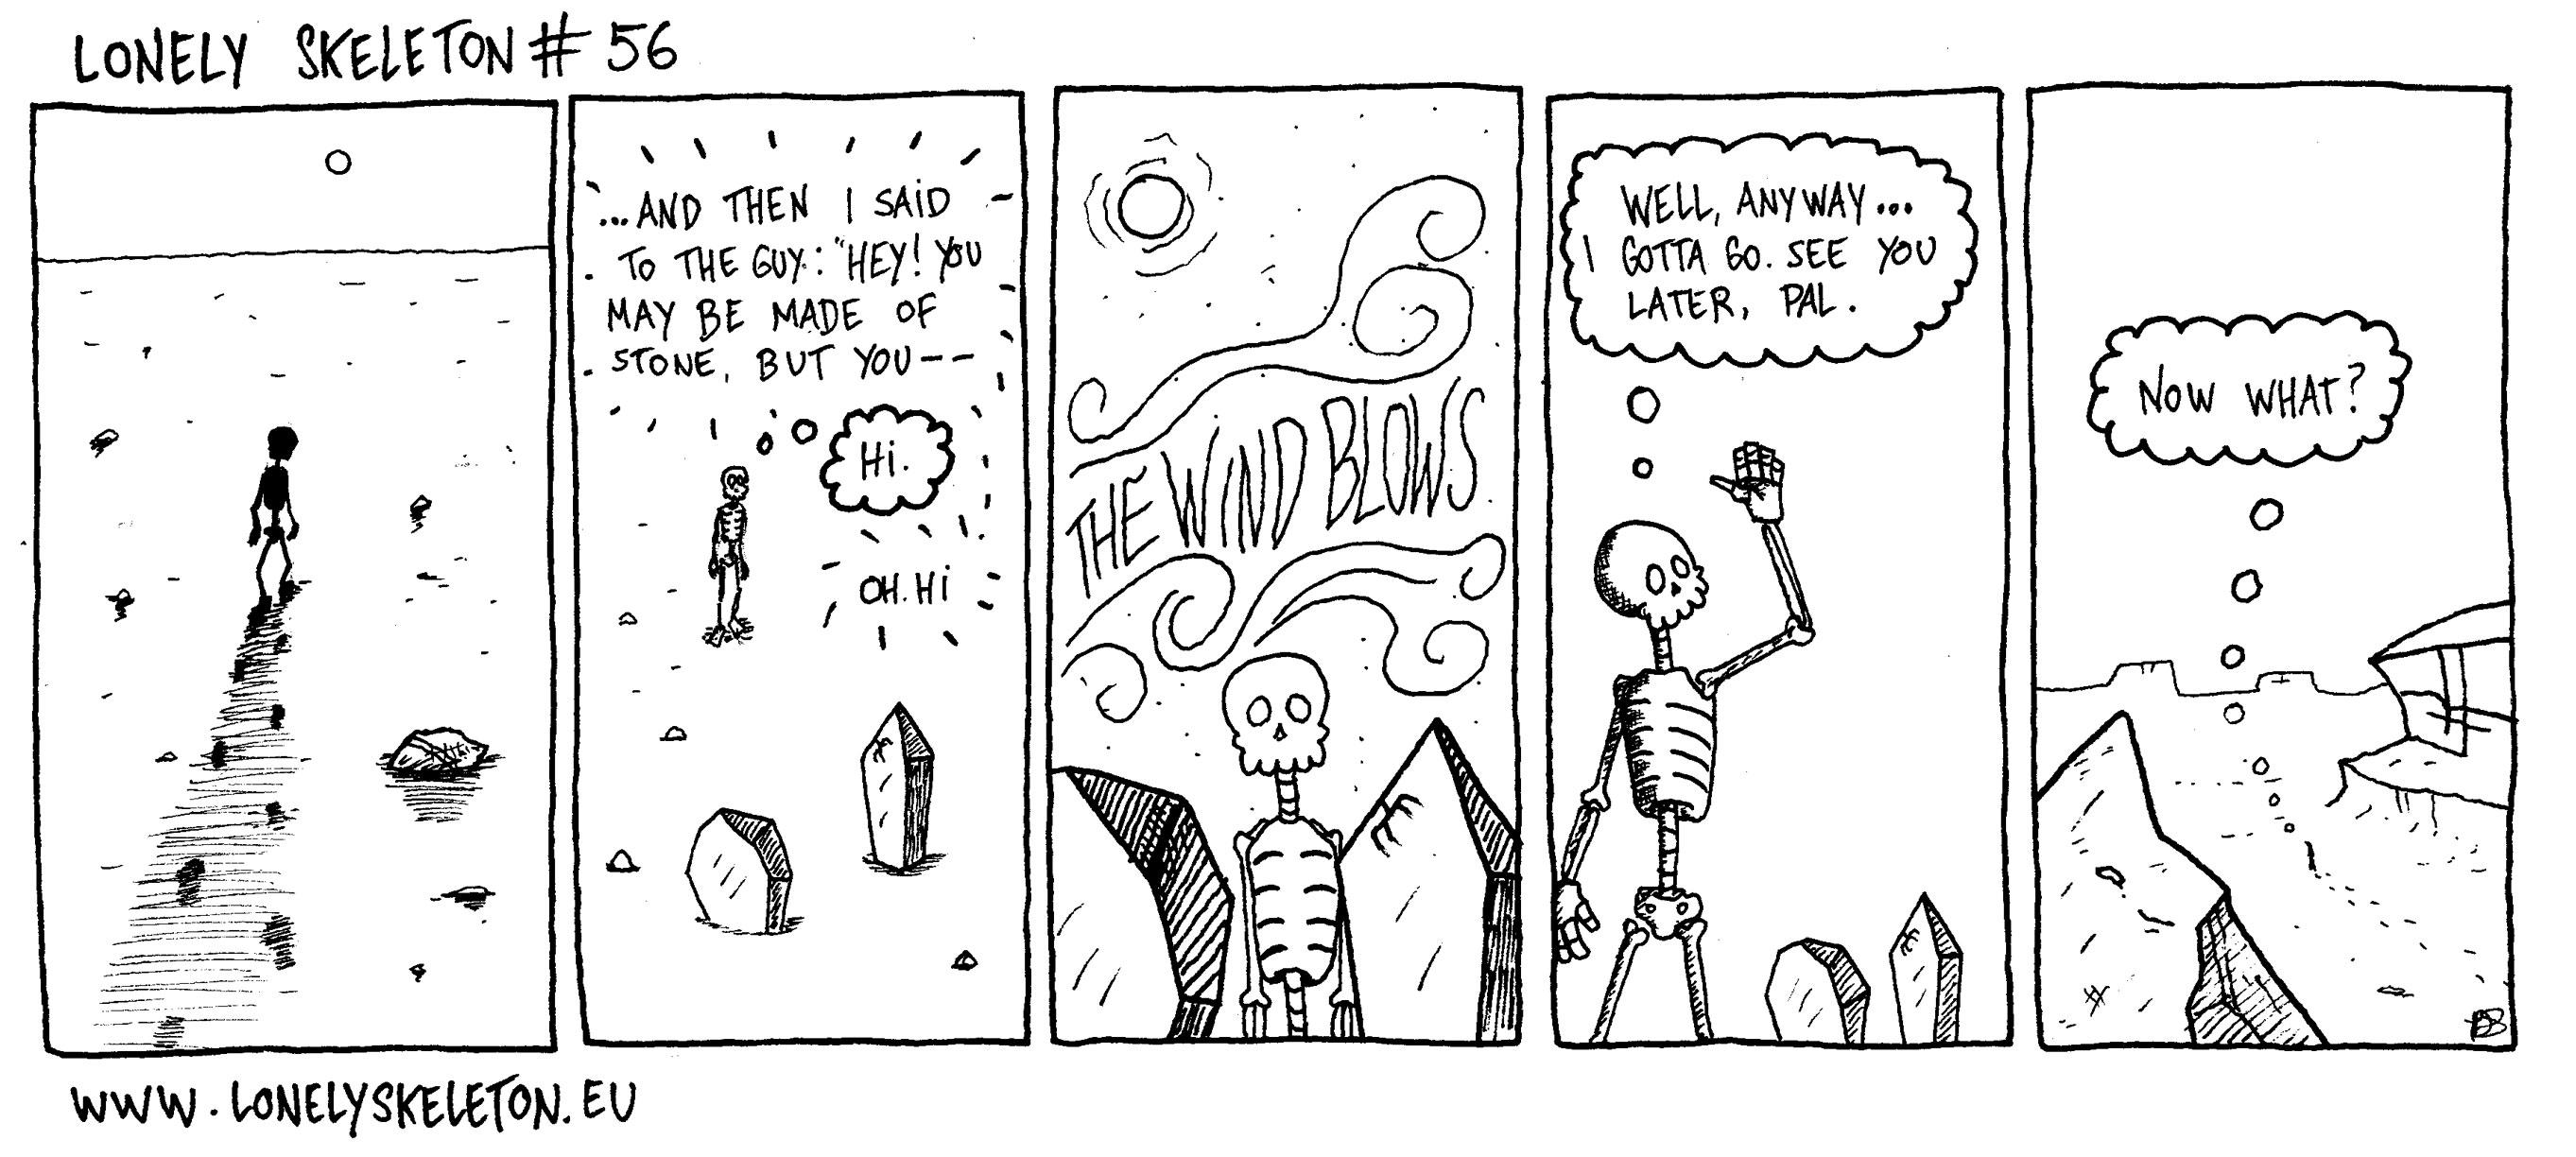 Lonely Skeleton #56